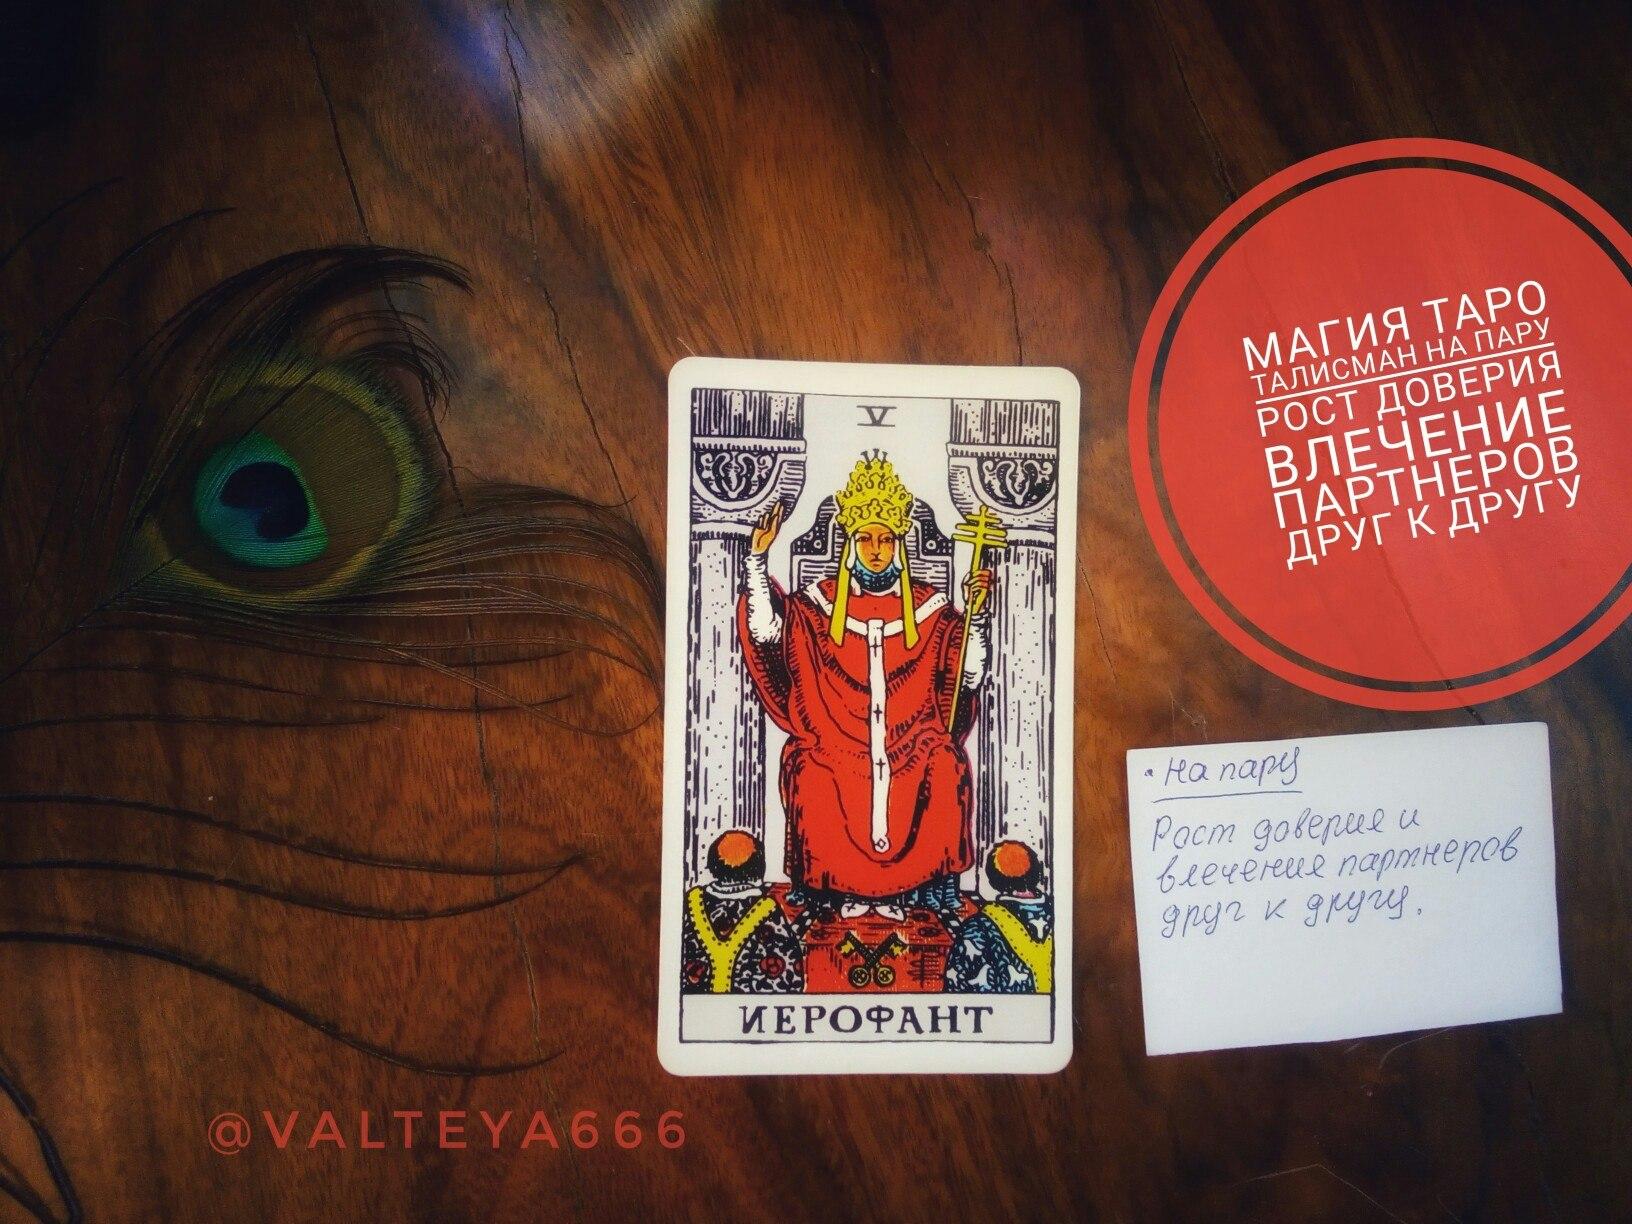 Хештег таро на   Салон Магии и мистики Елены Руденко ( Валтеи ). Киев ,тел: 0506251562  WwwL-2IEkpI